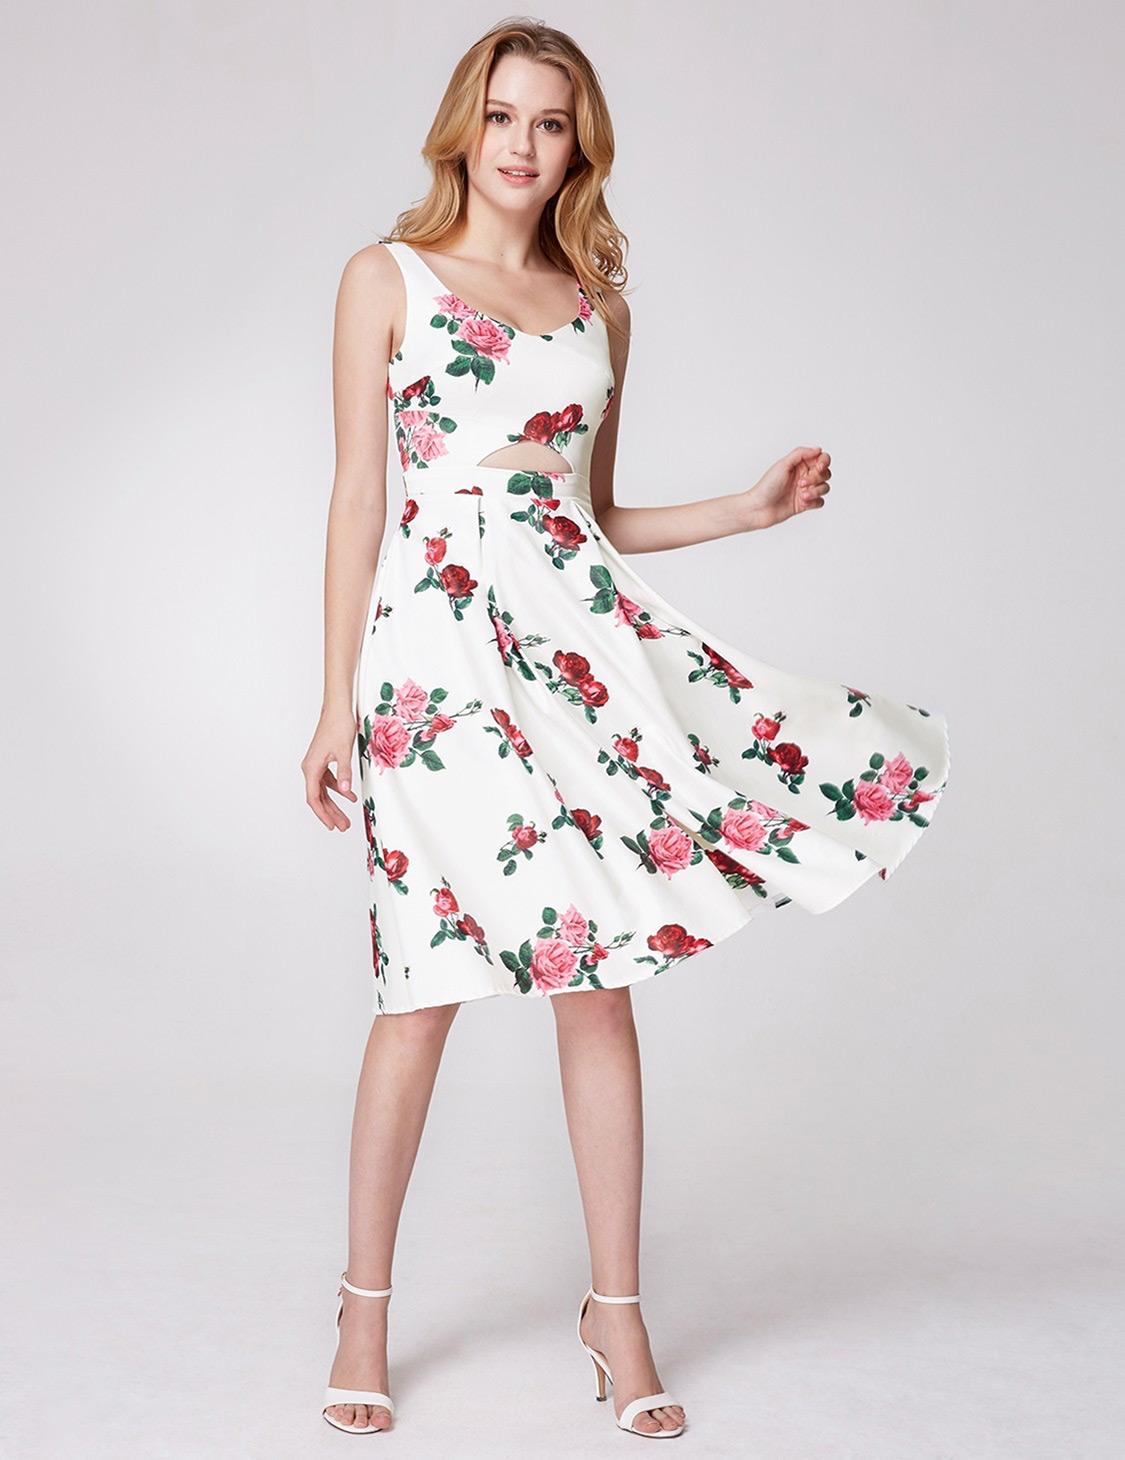 Rose Print Party Dress